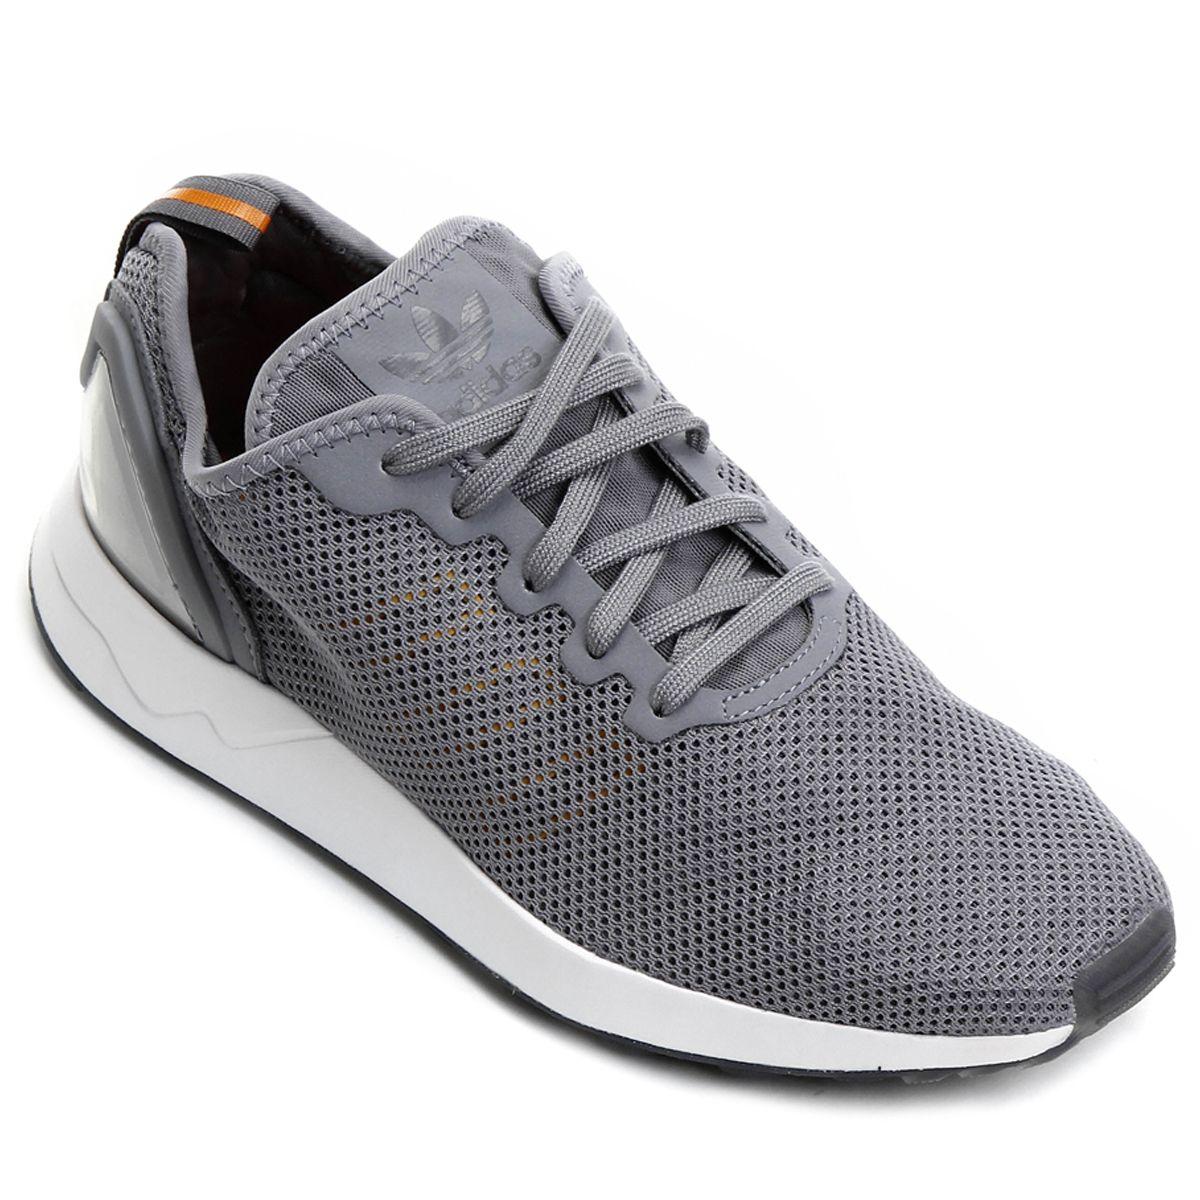 adidas nmd netshoes